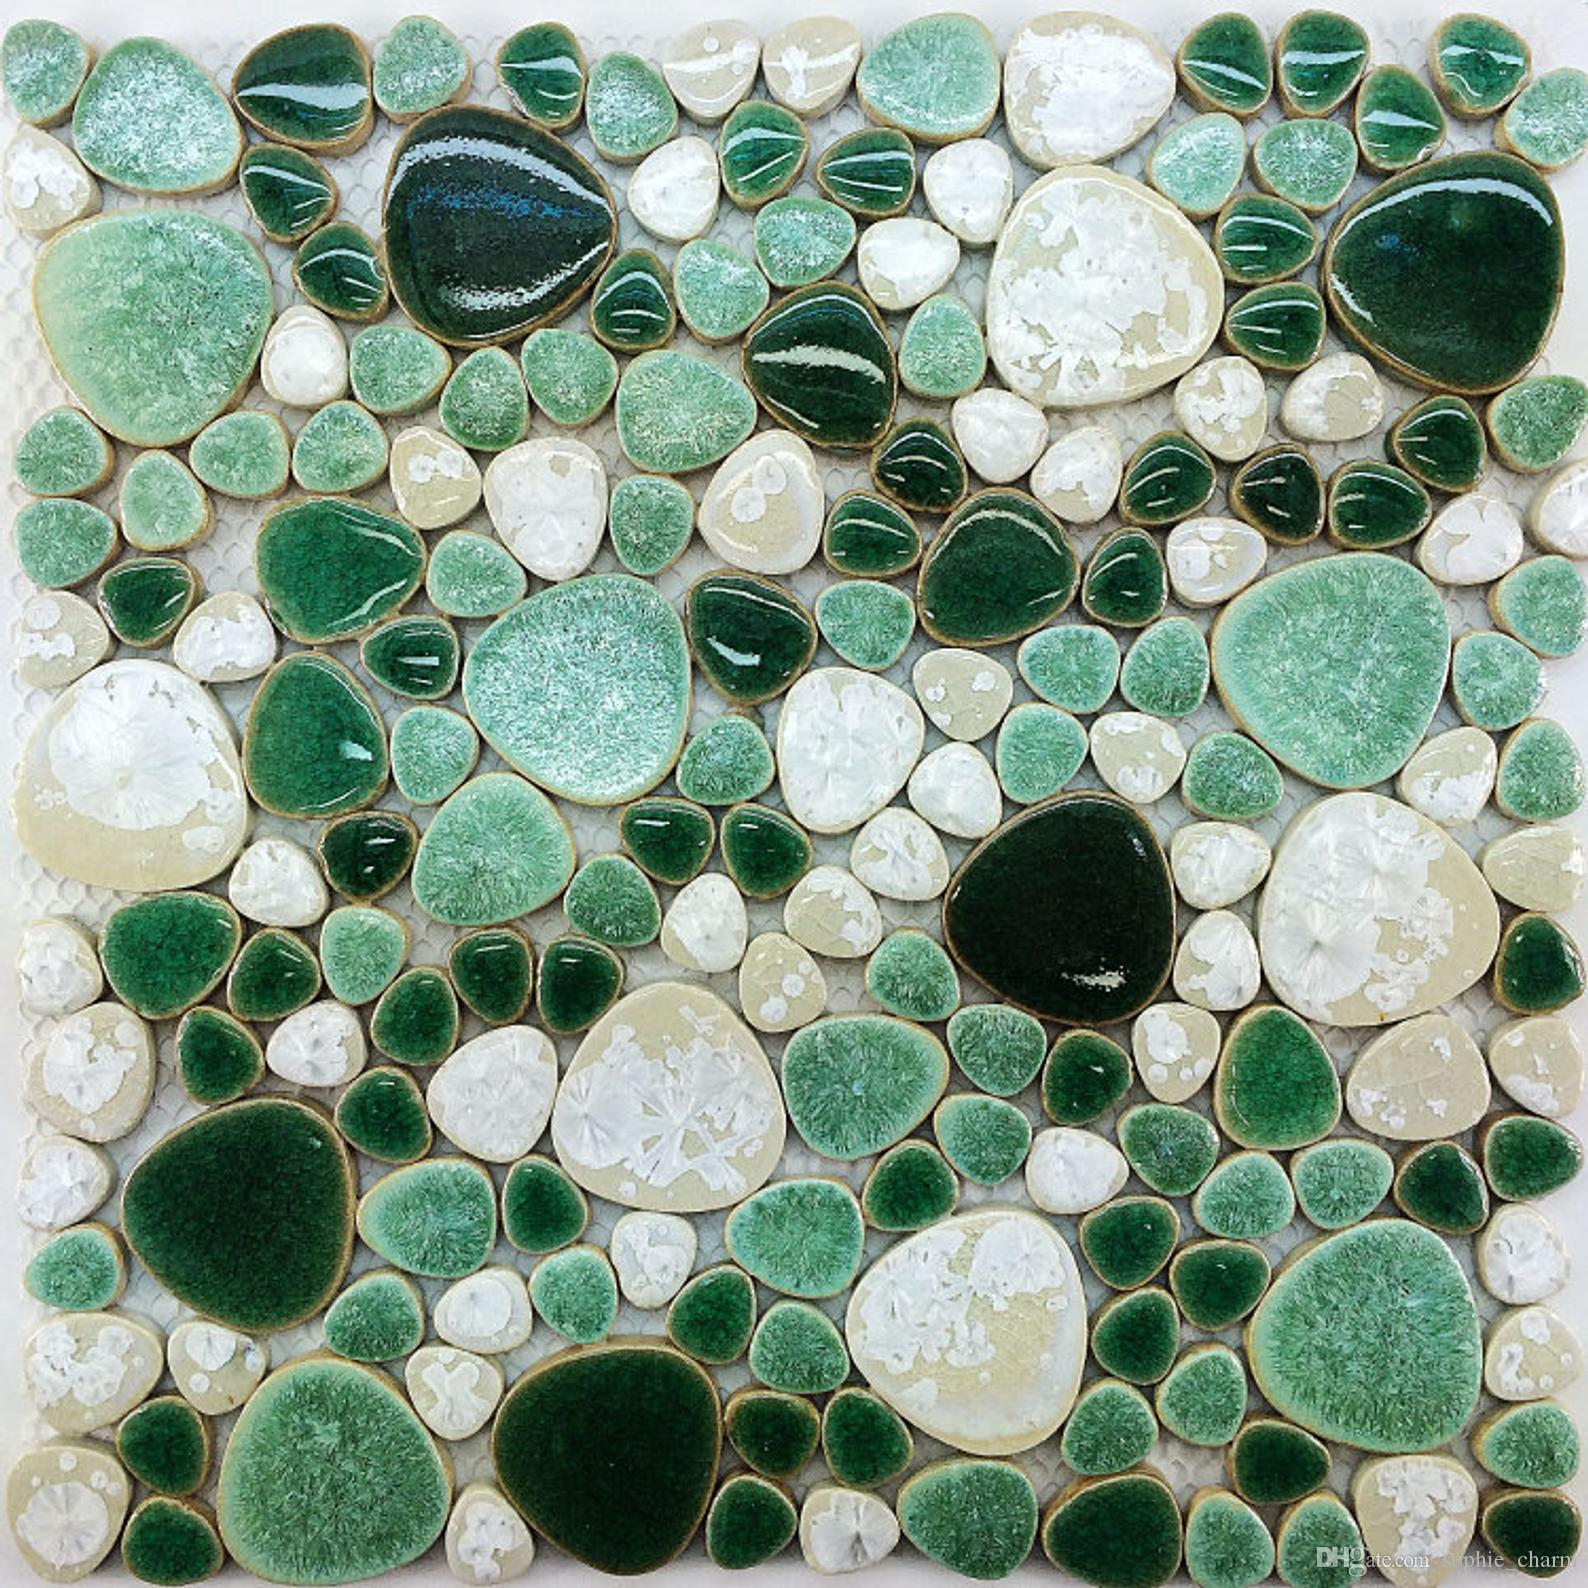 Green mix White pebble porcelain ceramic mosaic kitchen bathroom wall tile PPMT051 swimming pool flooring tiles